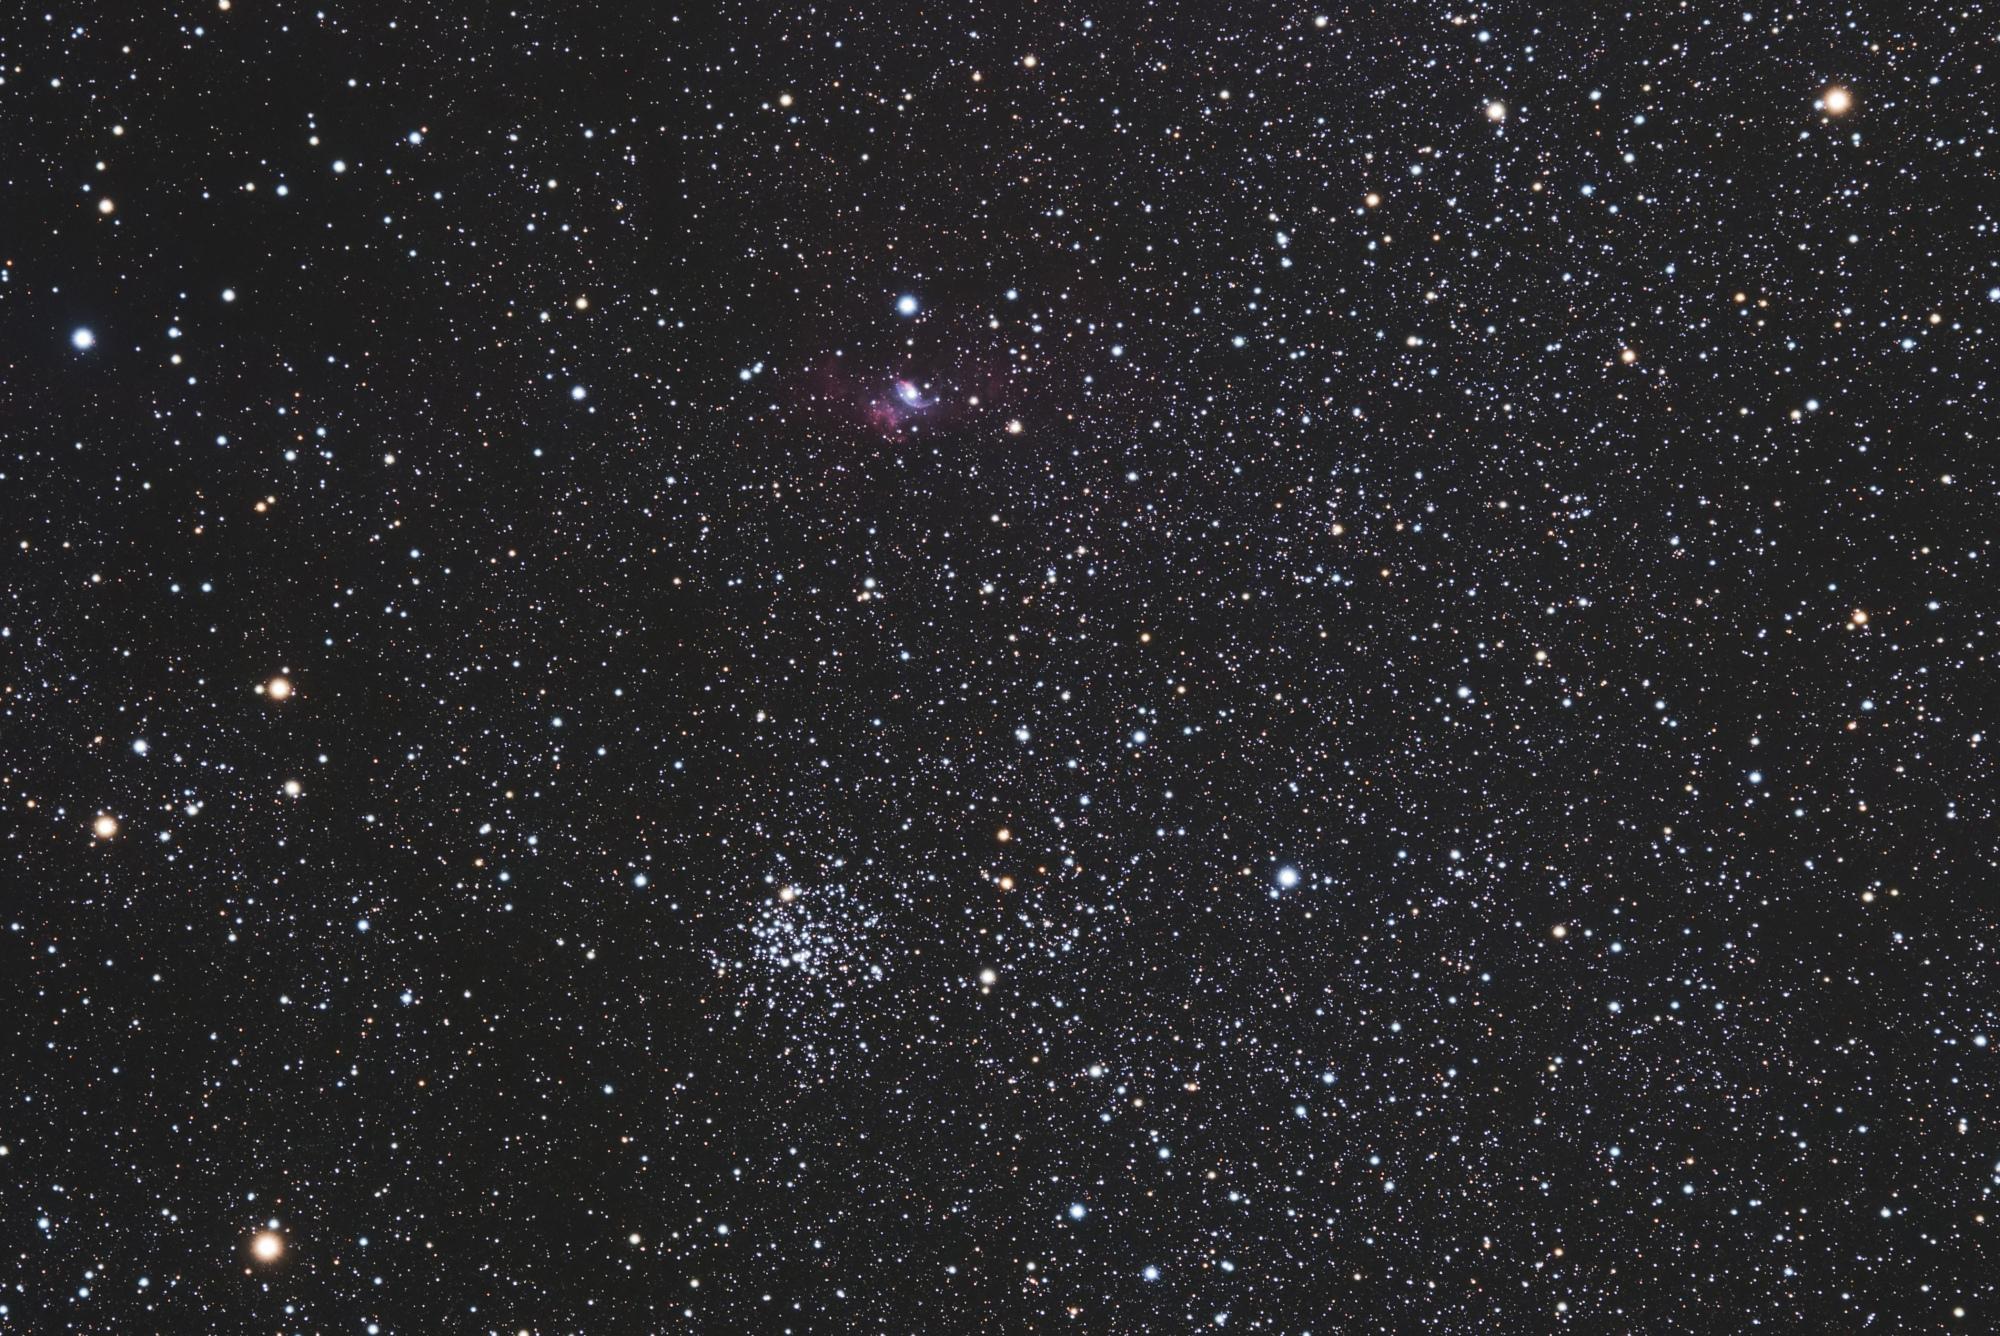 astro_Bubble.jpg.4189ad01bebacd0db3eb877e9d4266b3.jpg